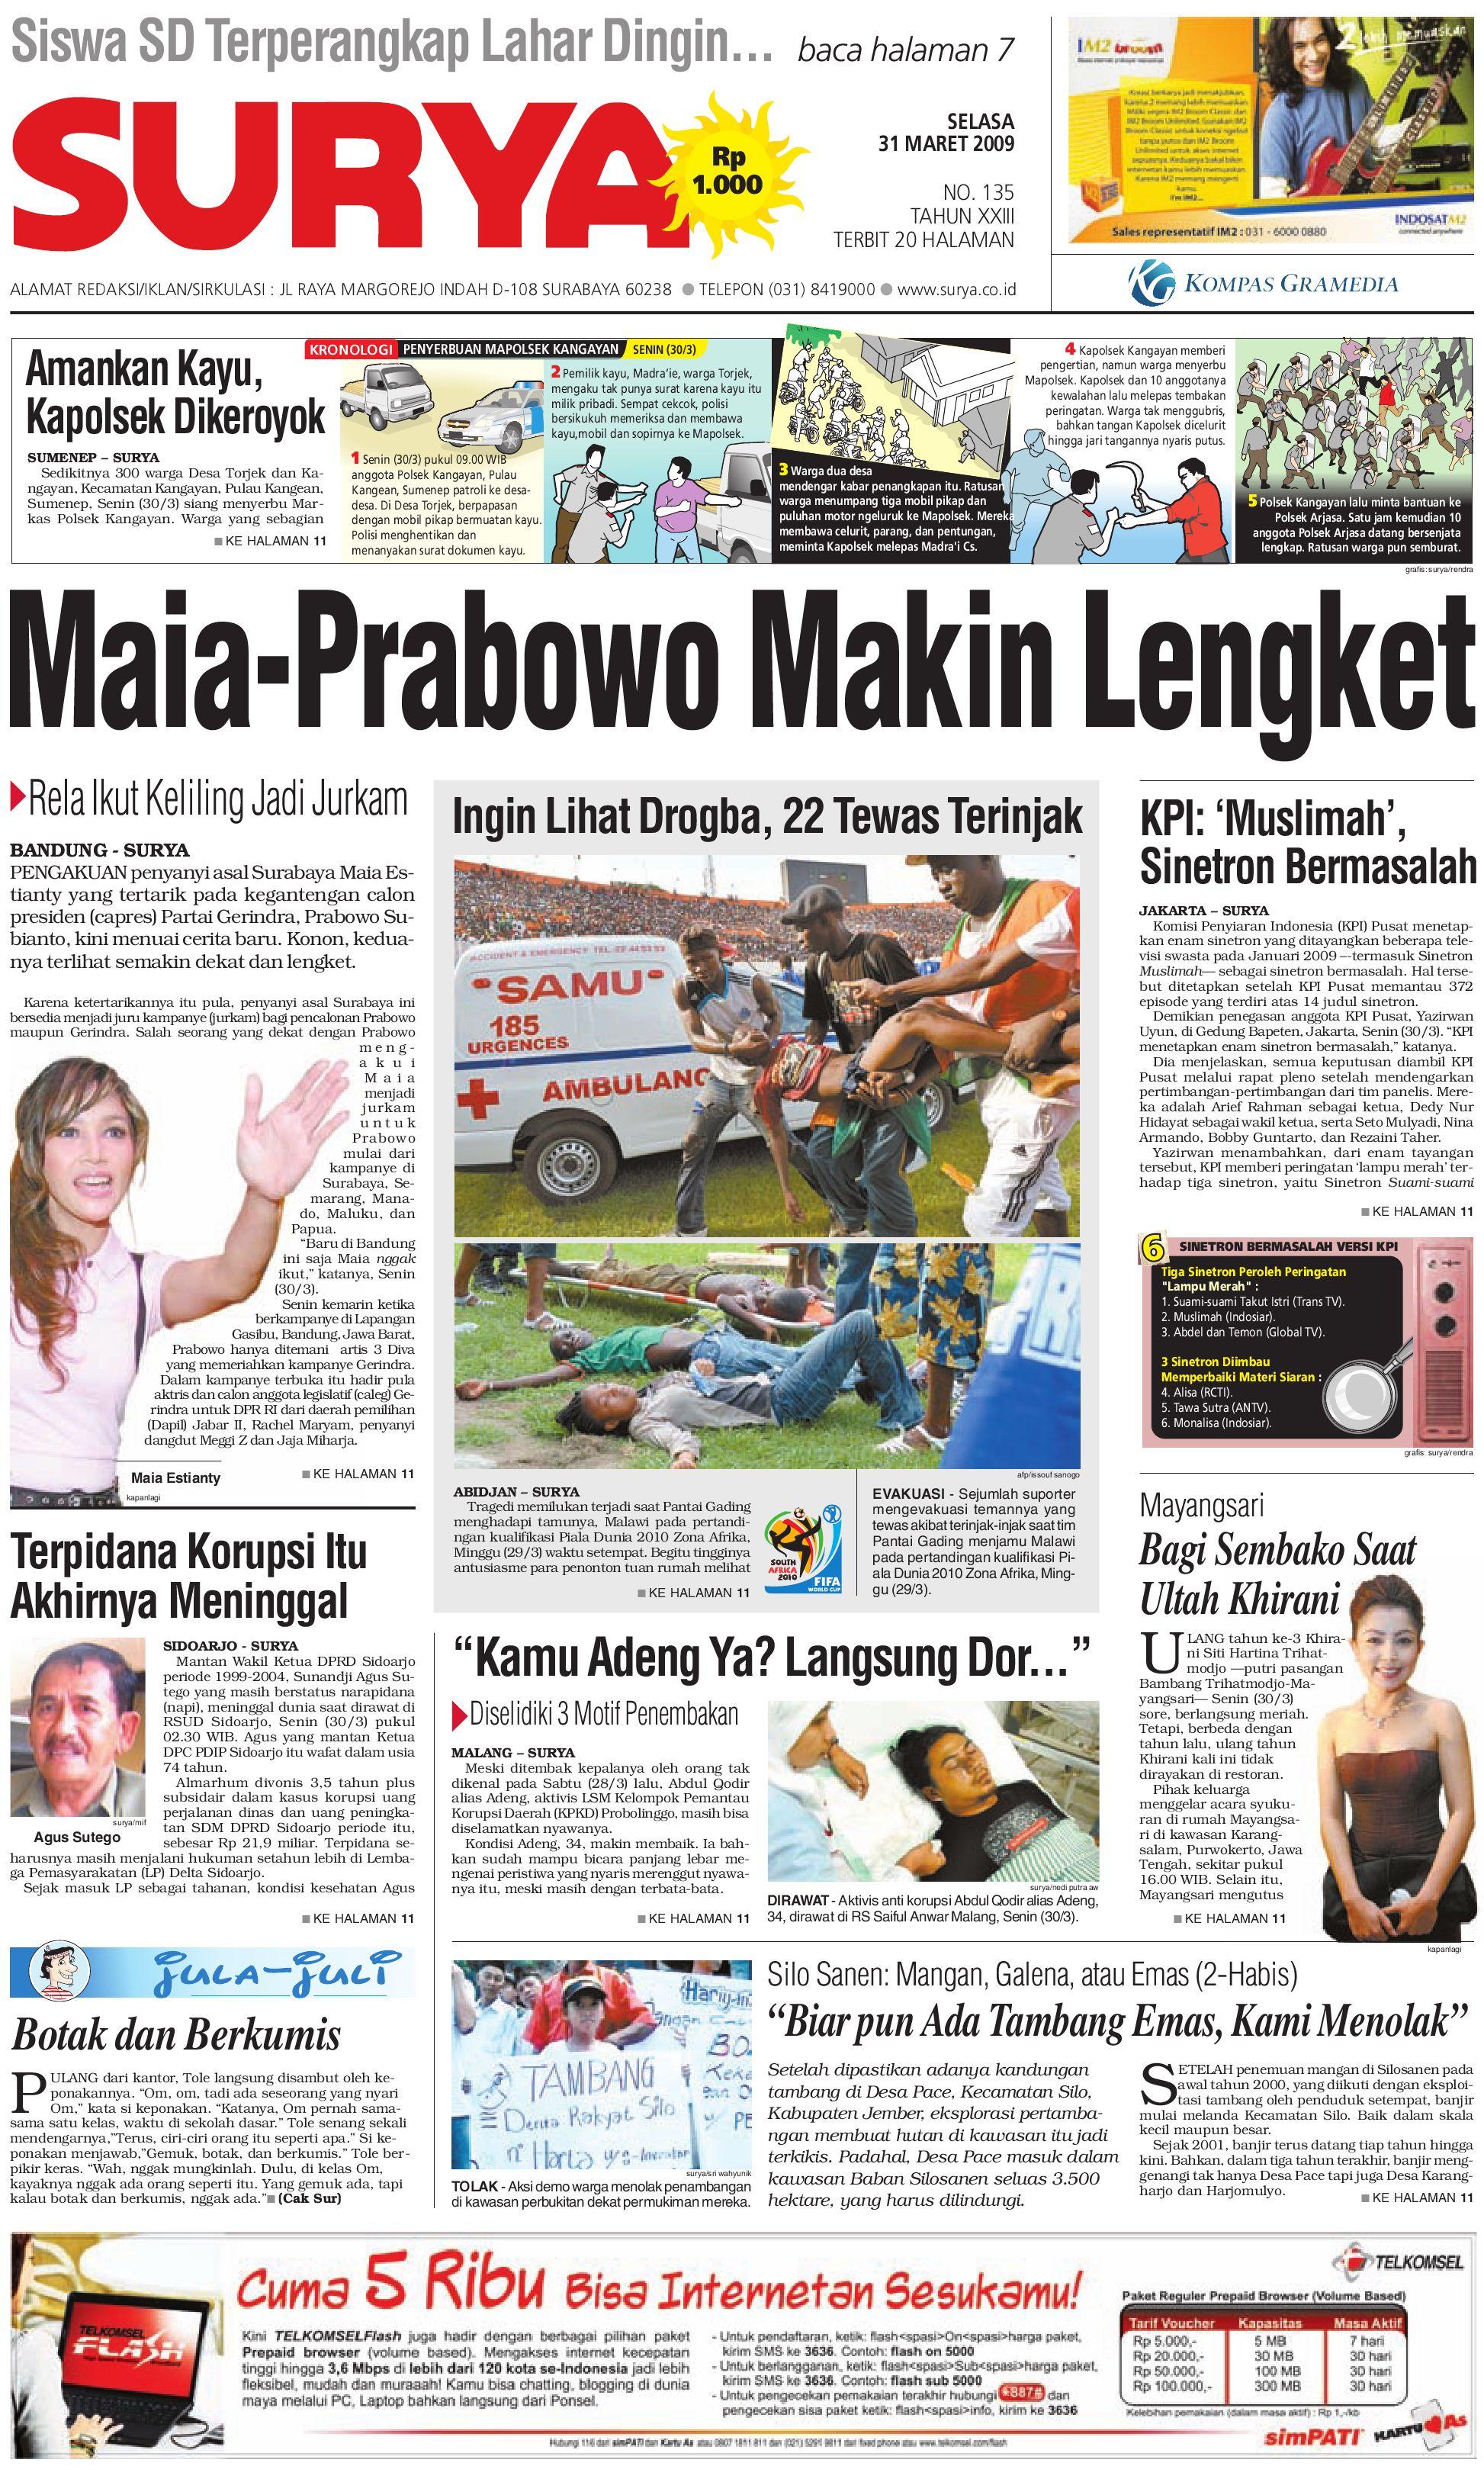 Surya Edisi Cetak 31 Maret 2009 By Harian Issuu Produk Ukm Bumn Sutra Super